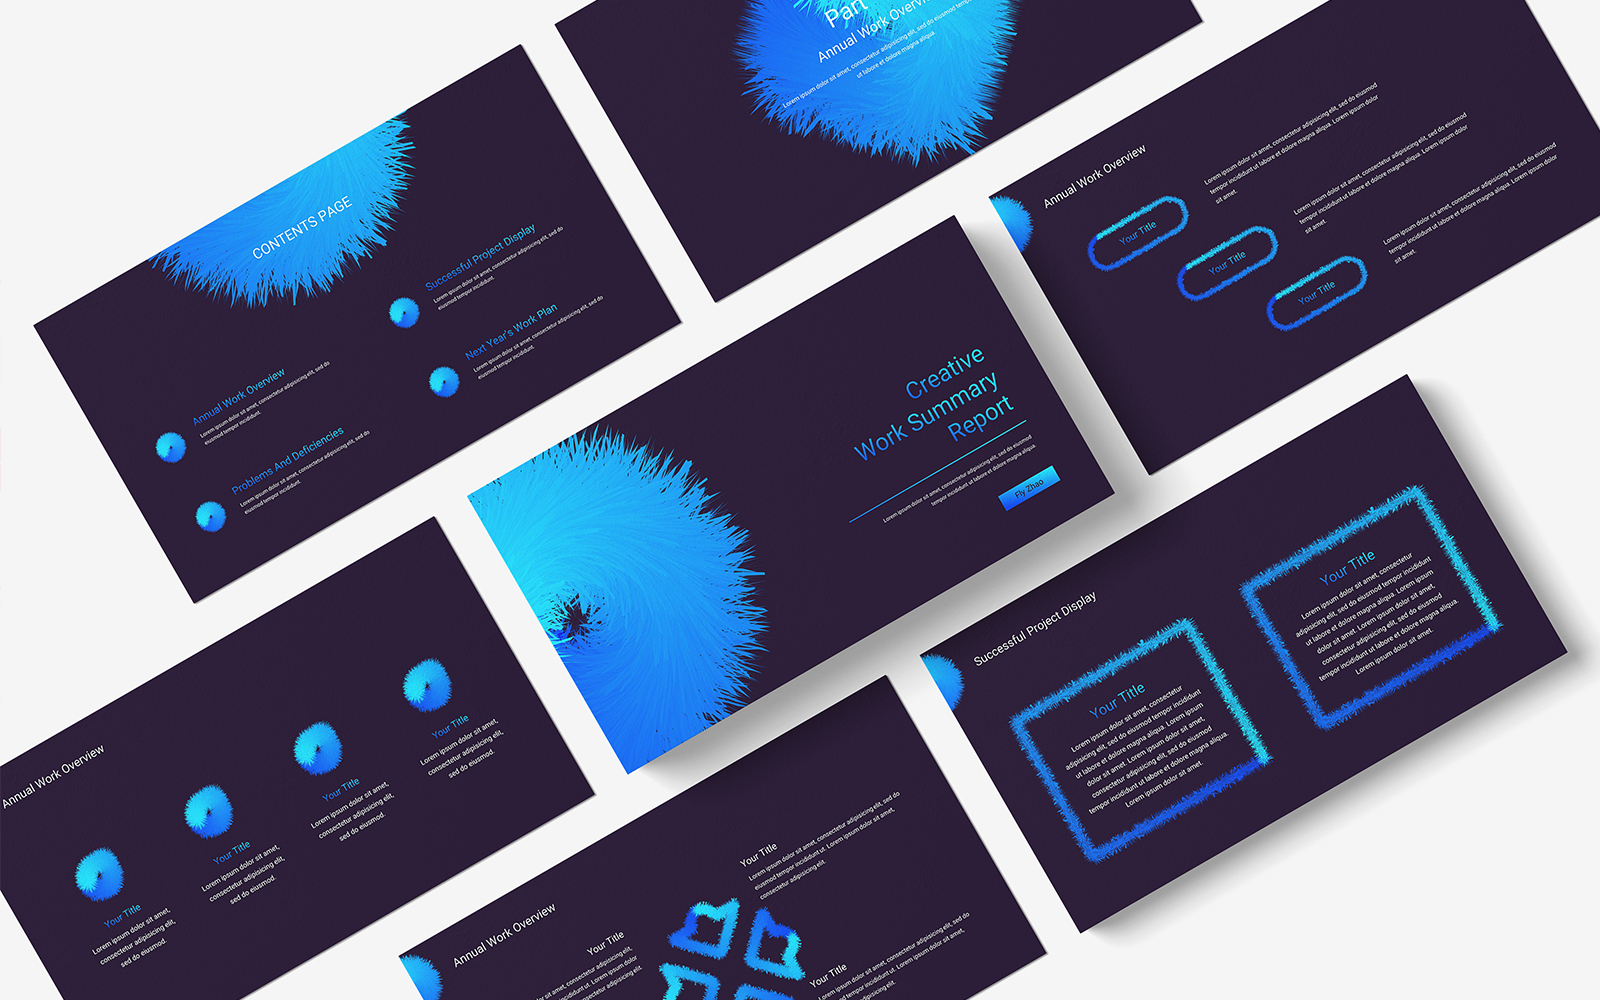 Creative Work Summary Report PowerPoint template